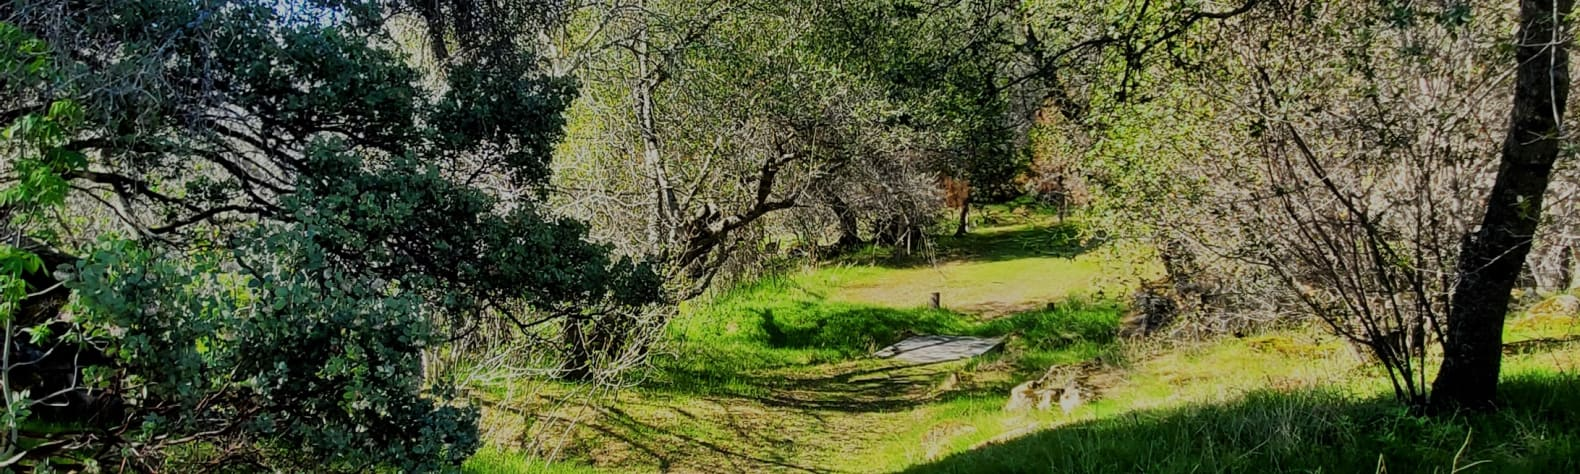 Hillside Gateway to Sierras